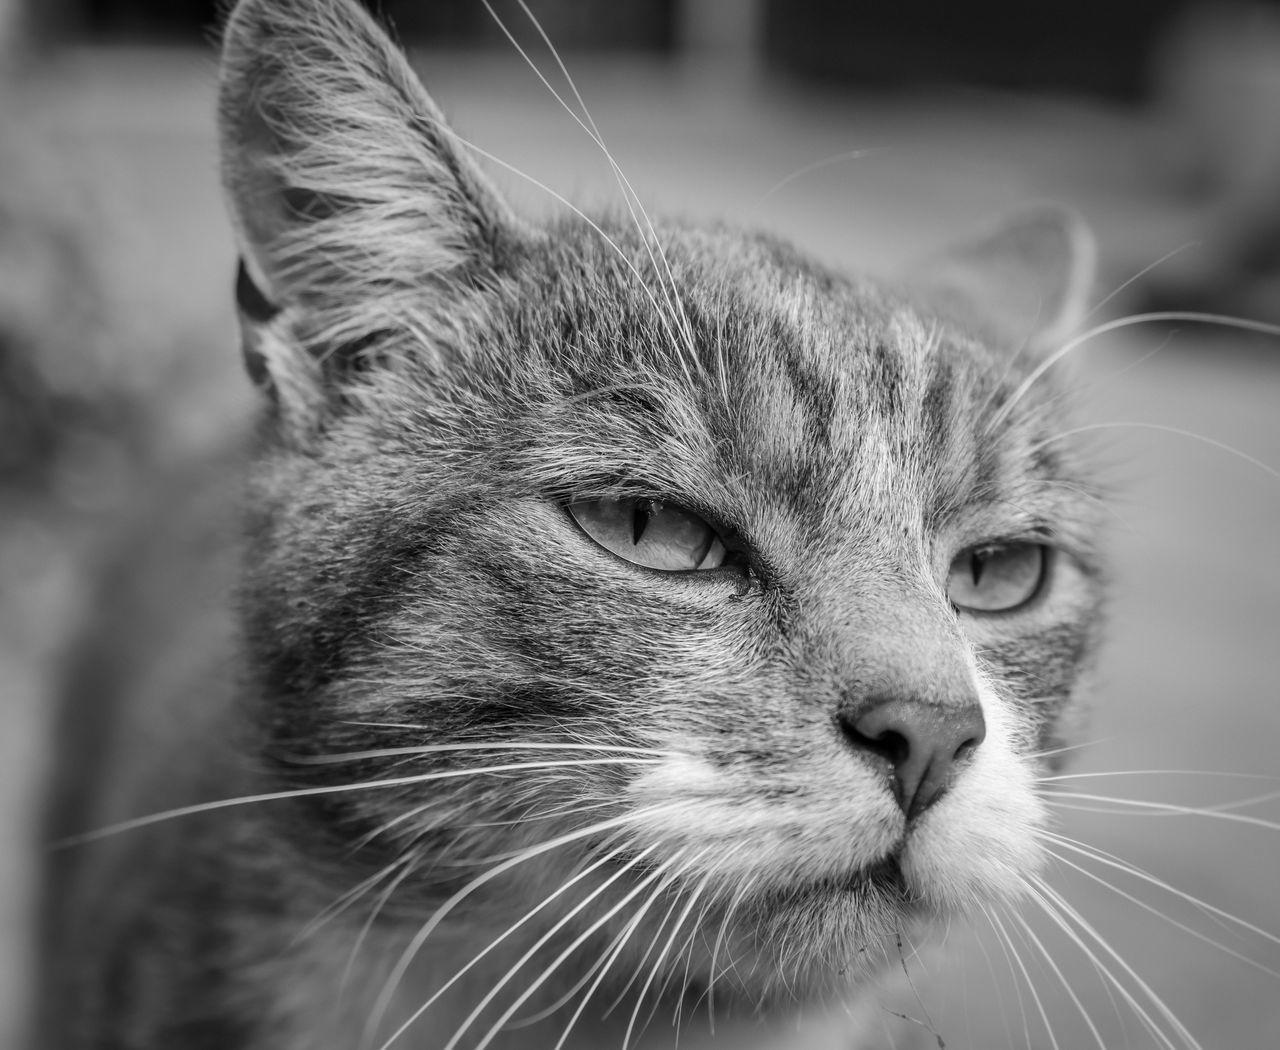 Augen Fell Haustier Kater Katze Kopf Nase Portait Schnurrbart Schwarz & Weiß Tier Tier Ha